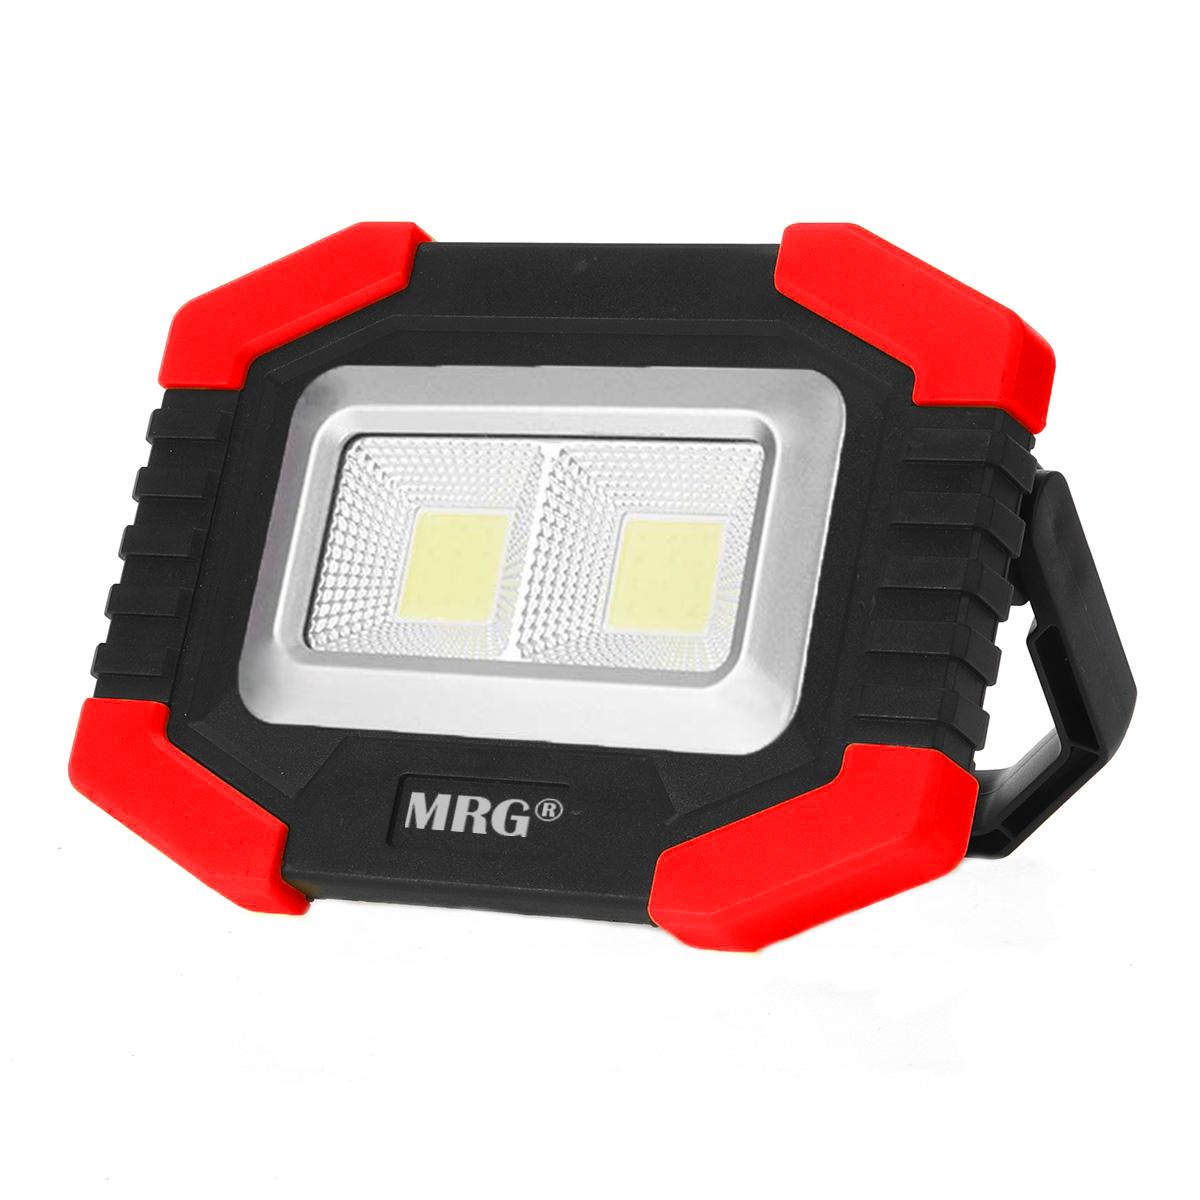 Proiector LED MRG M-T-917A, Portabil, Cu acumulator, Reincarcabil